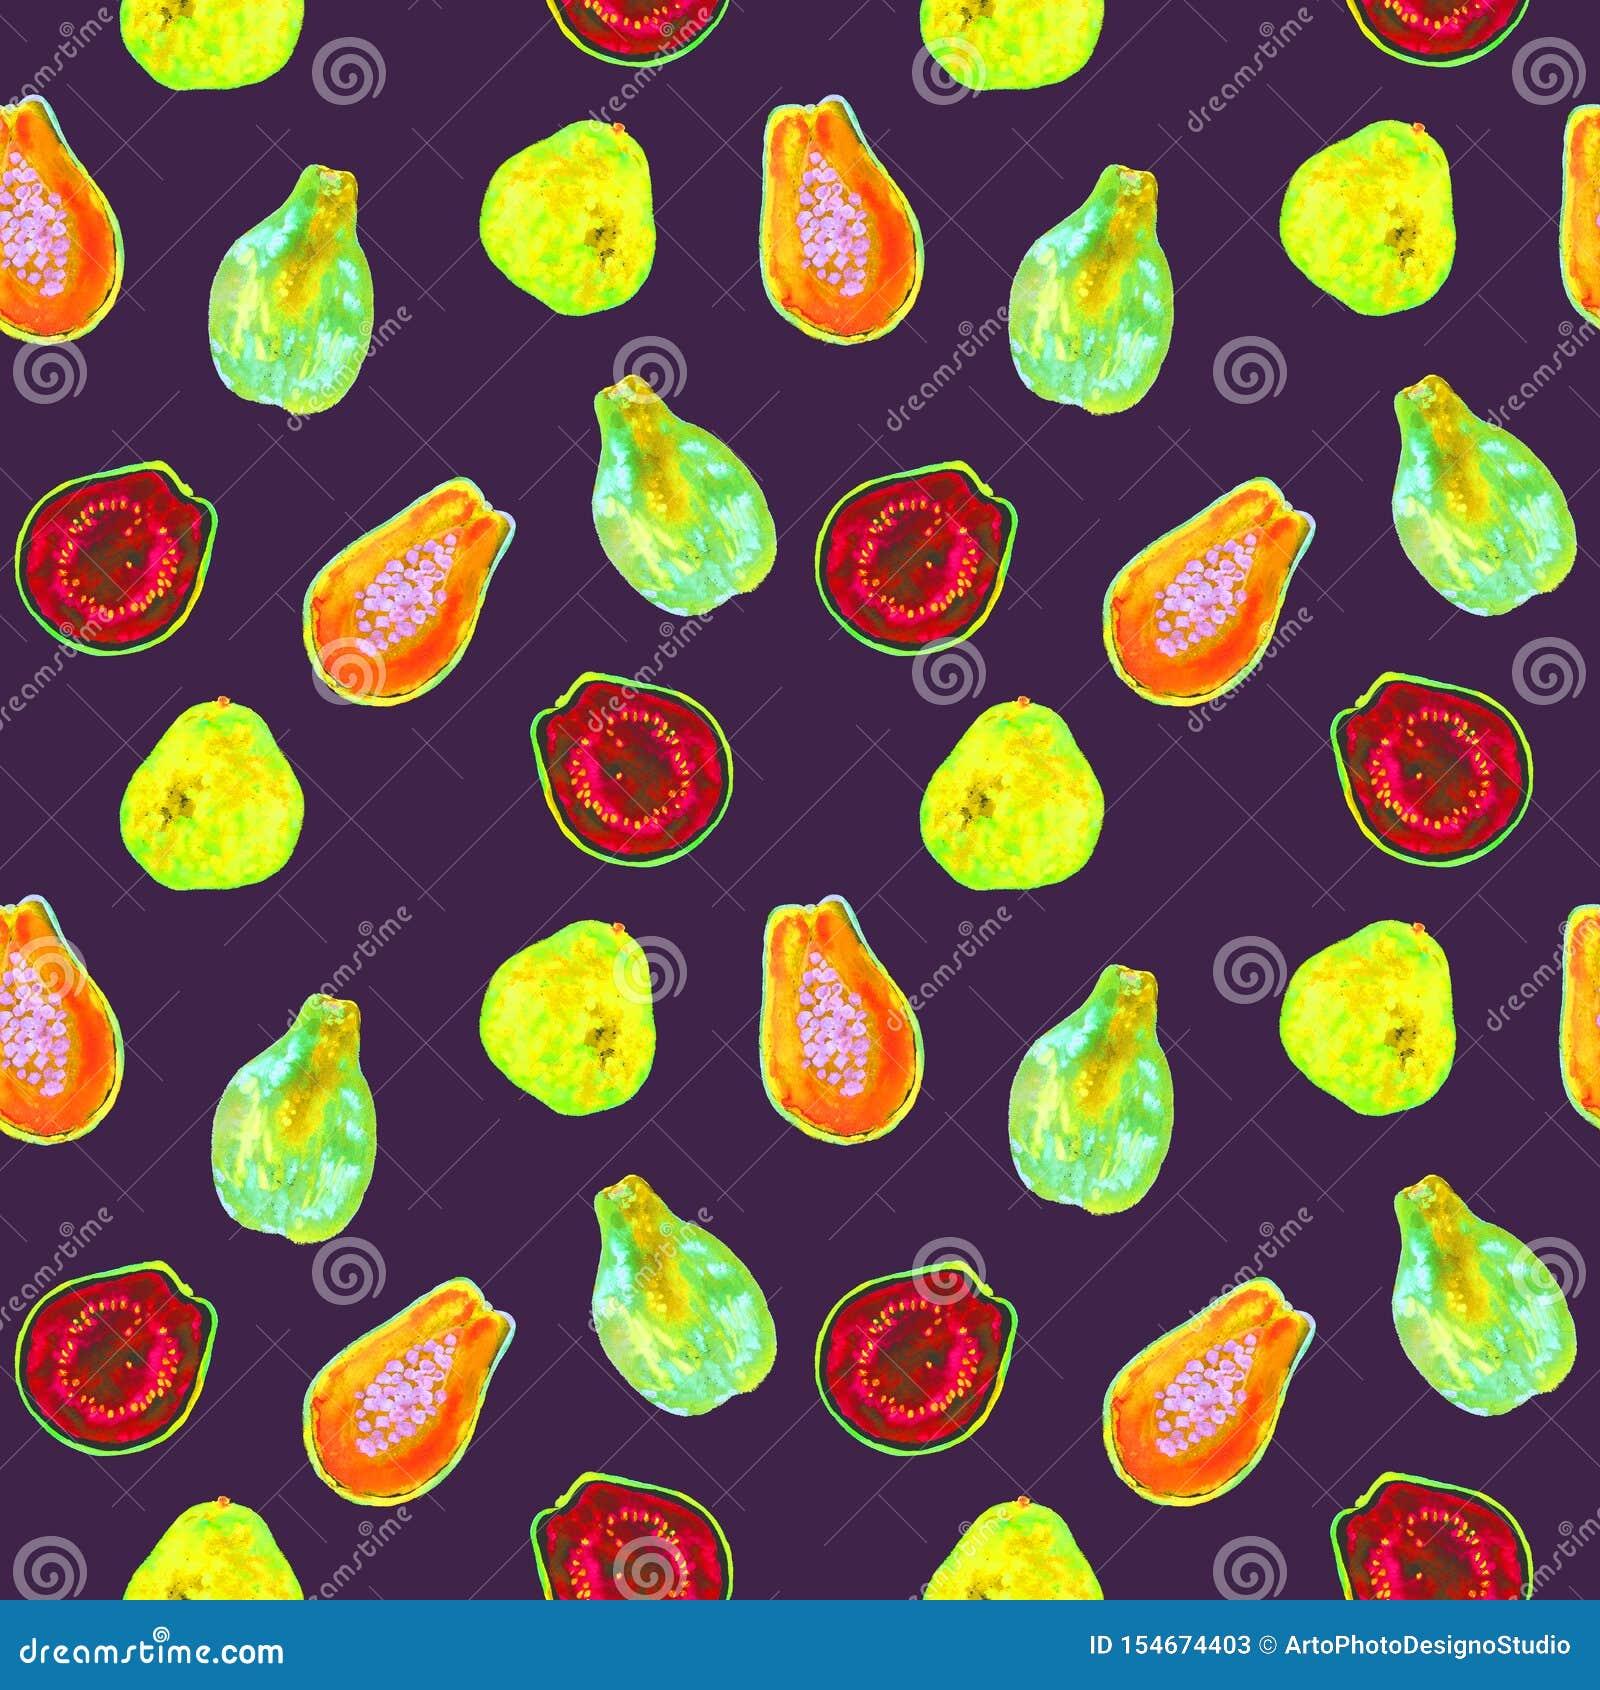 Papaya fruit Carica papaya and guava, half slice, seamless pattern design, hand painted watercolor illustration